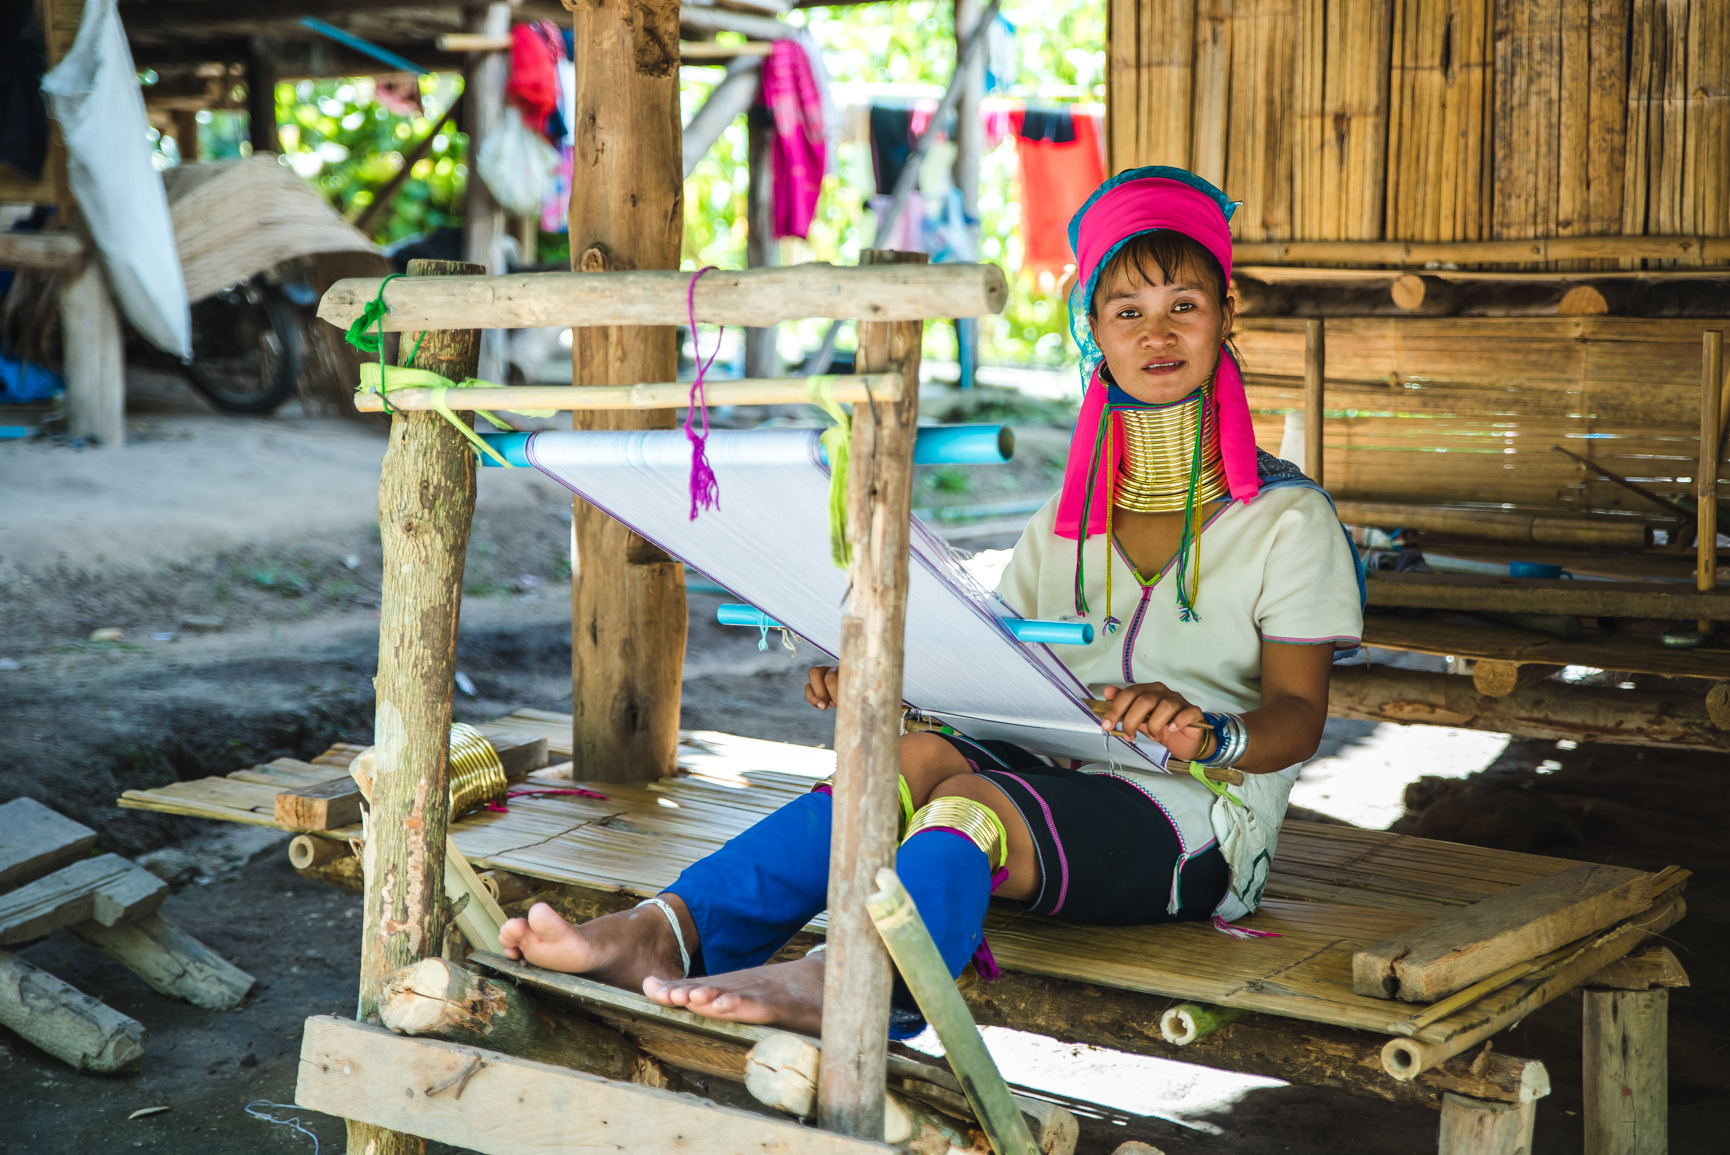 Ibrahim Badru Thailand eyeobee ART The Wandering eye_-29.jpg